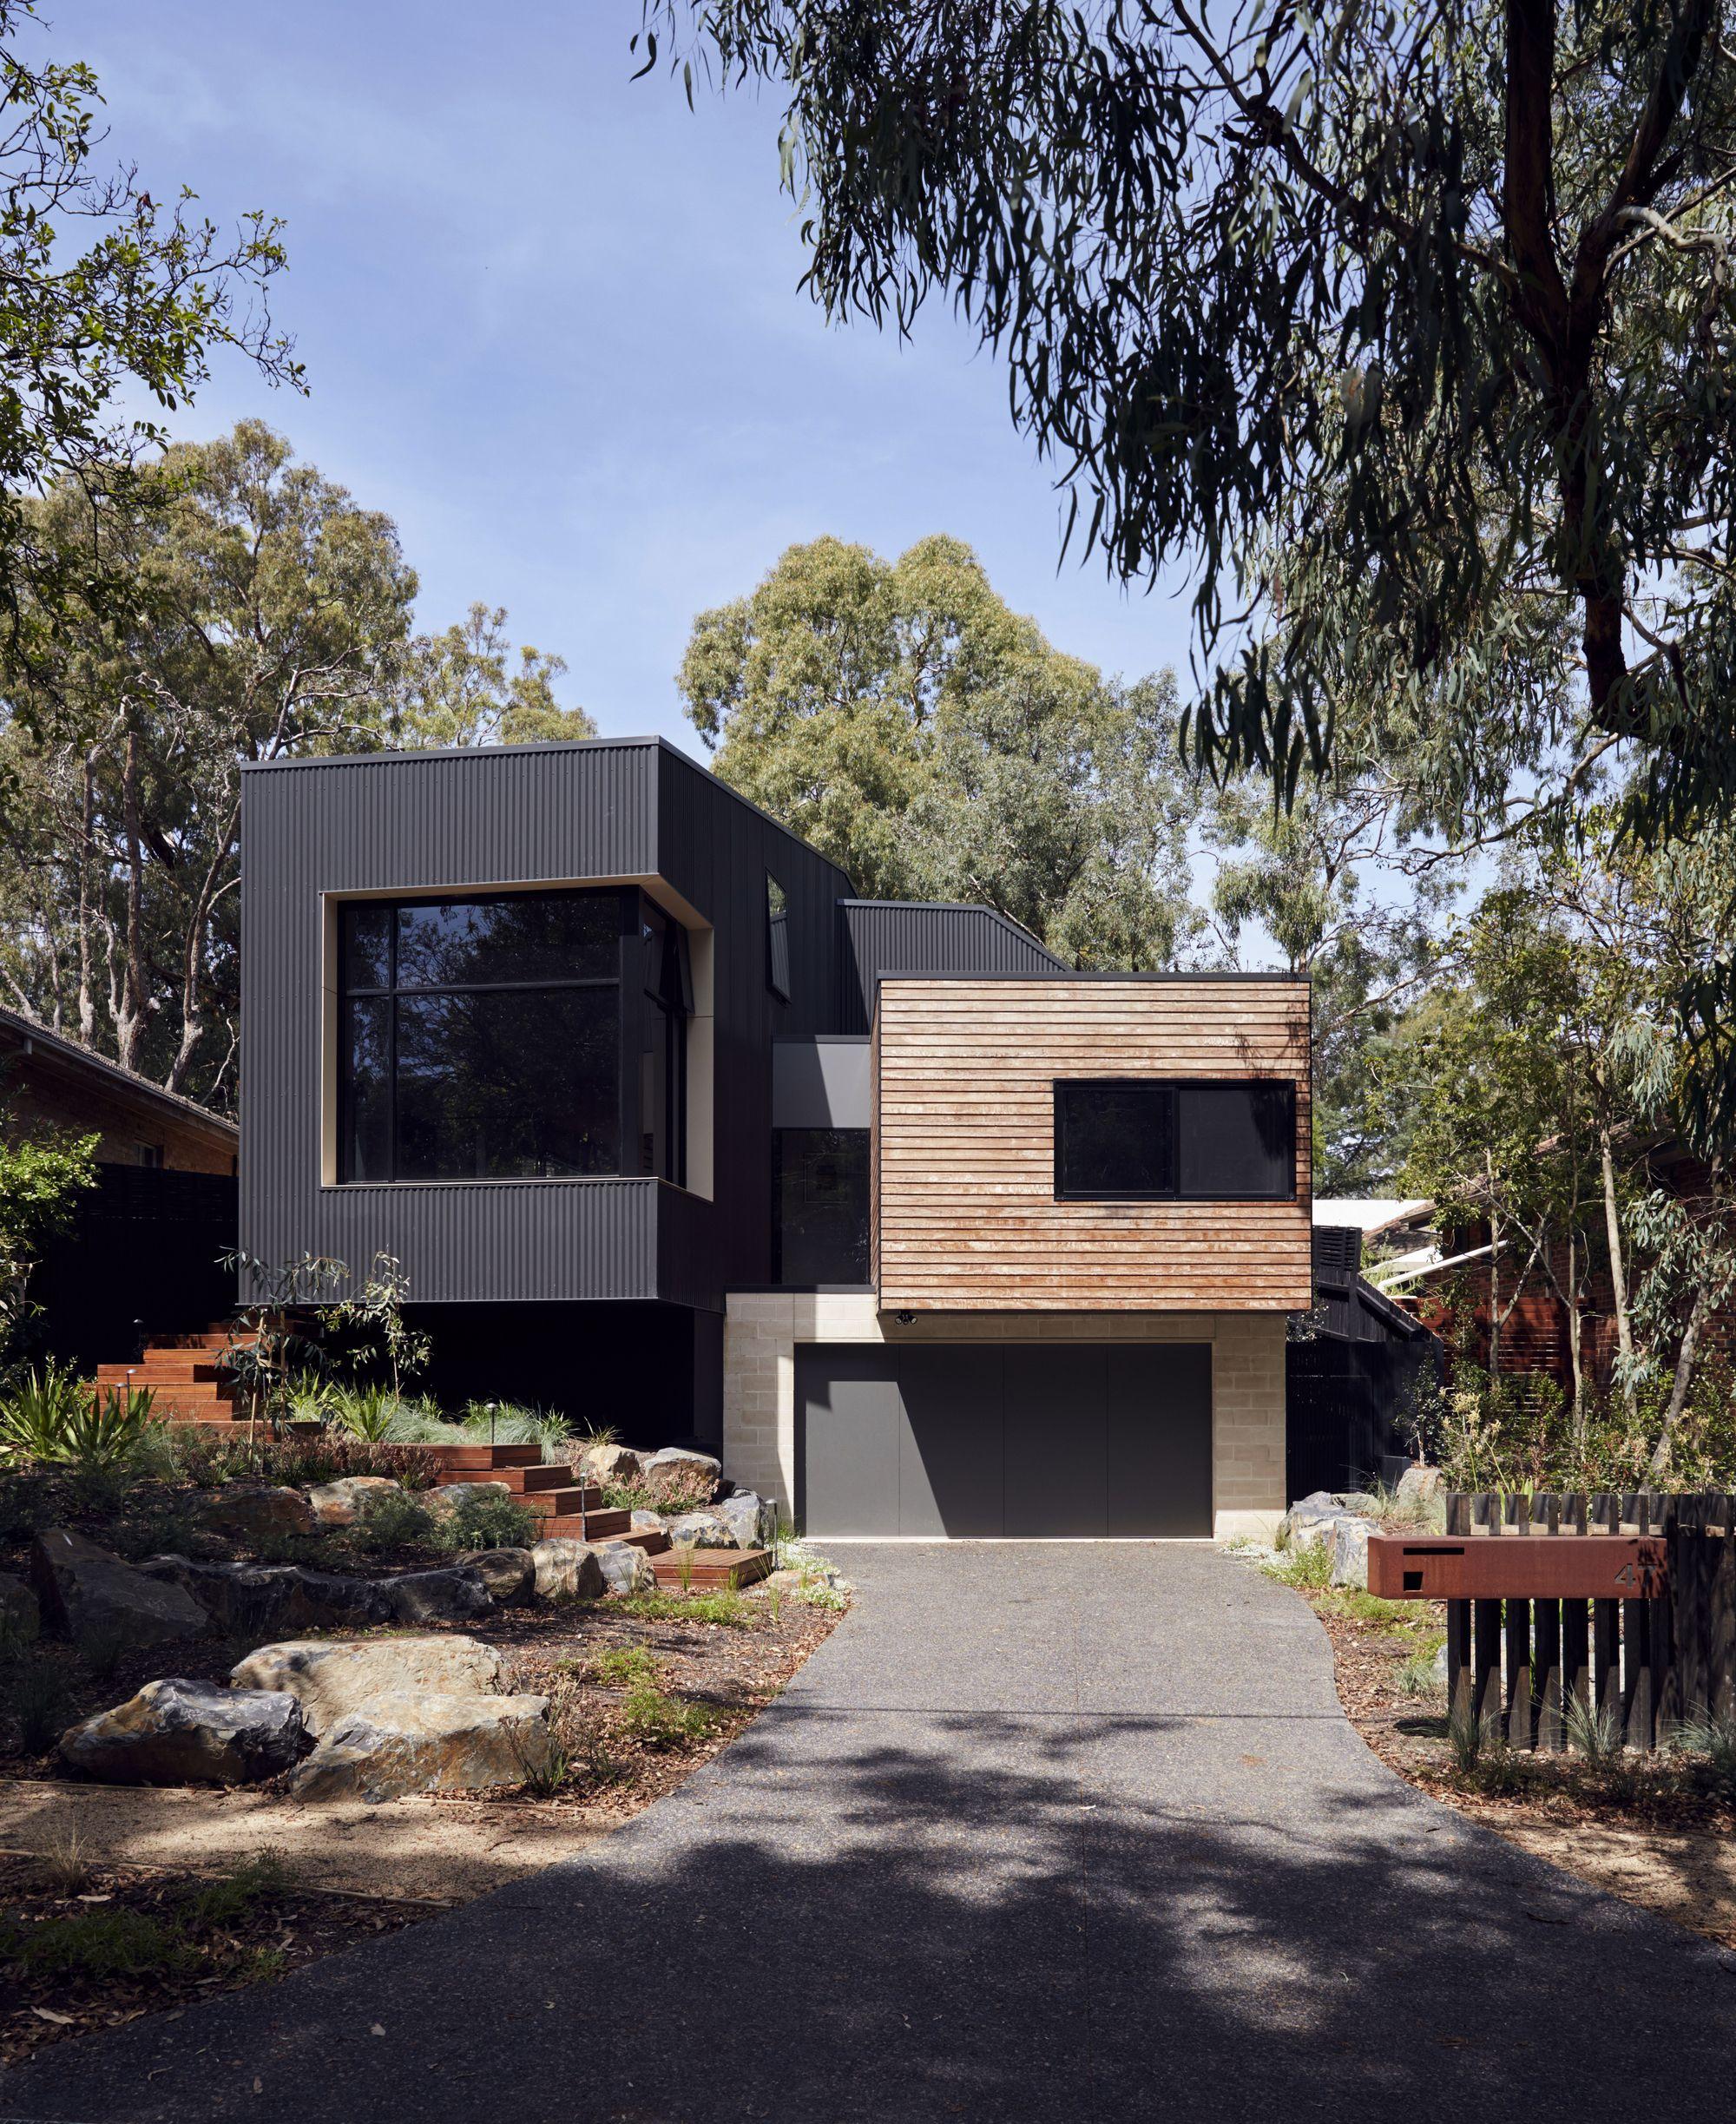 Architettura Case Moderne Idee blackburn house / archiblox | architettura, case moderne e house